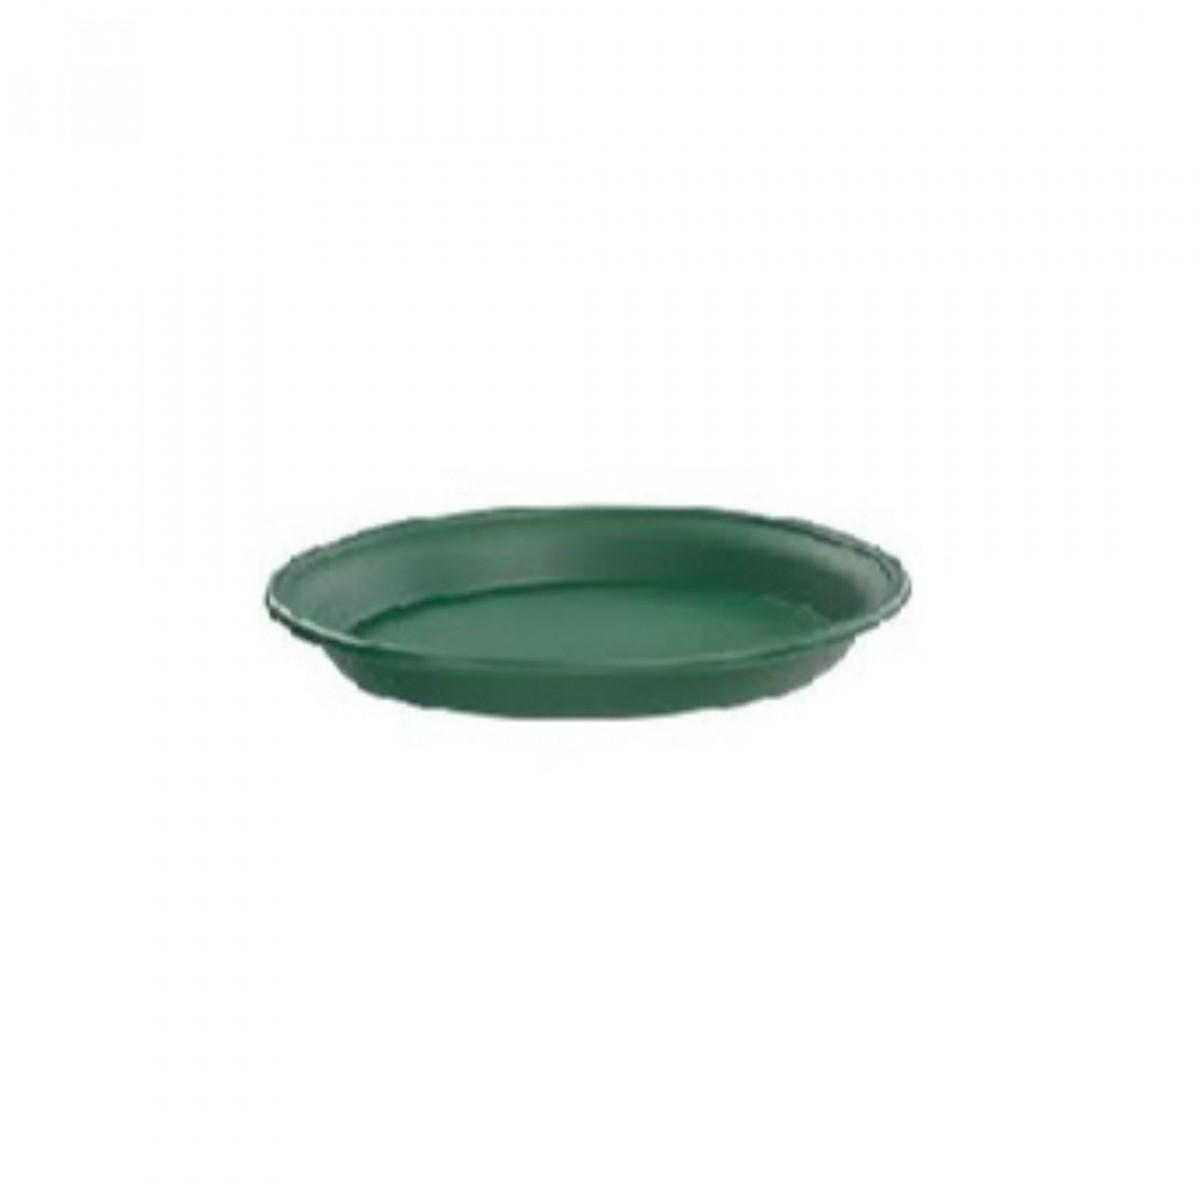 18CM Plastic Tray Green - 10 No